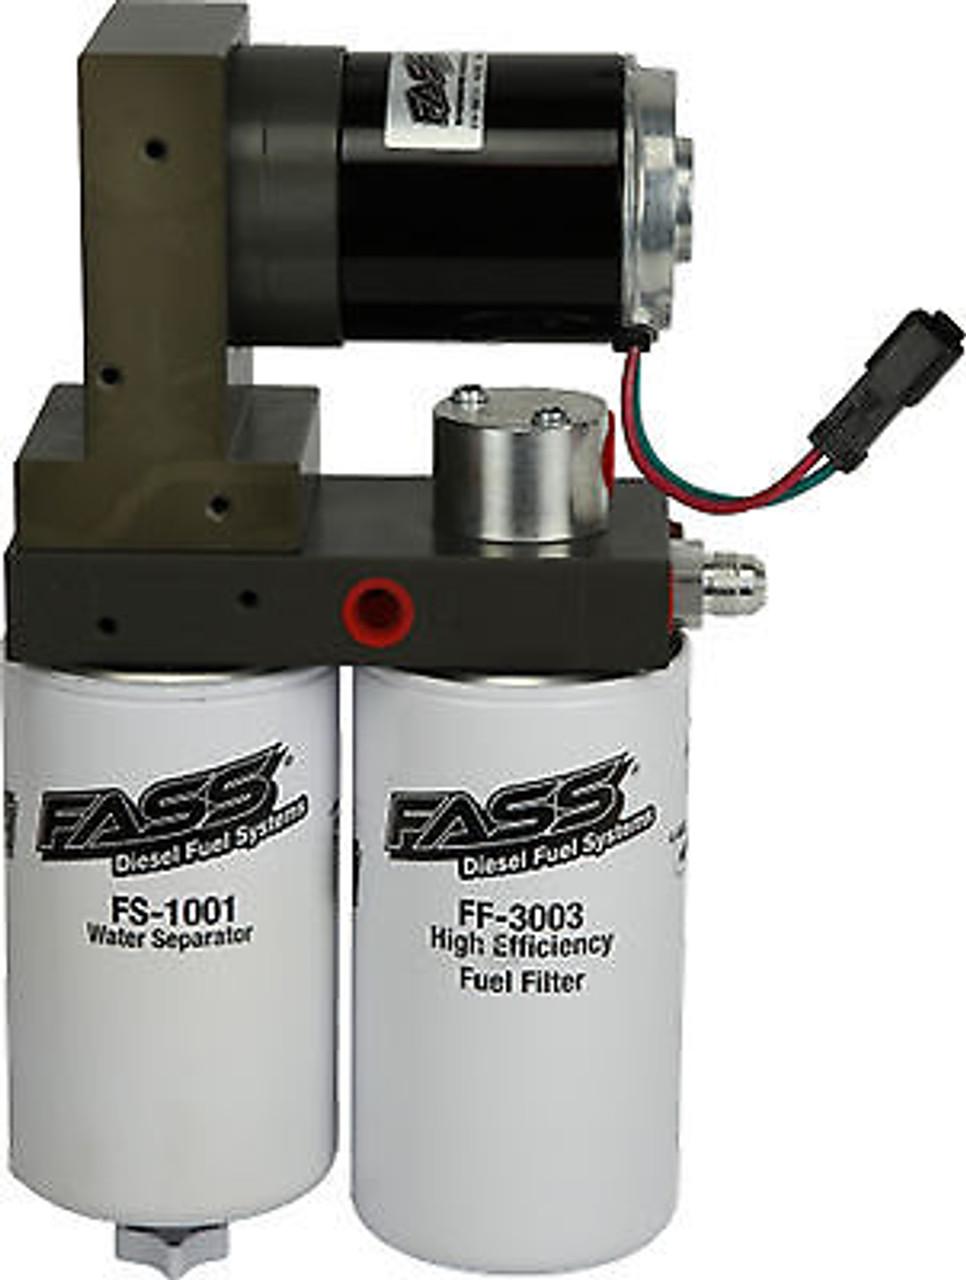 FASS FUEL PUMP TITANIUM SIGNATURE SERIES FOR 05-18 DODGE CUMMINS DIESEL 250 GPH - TS D07 250G